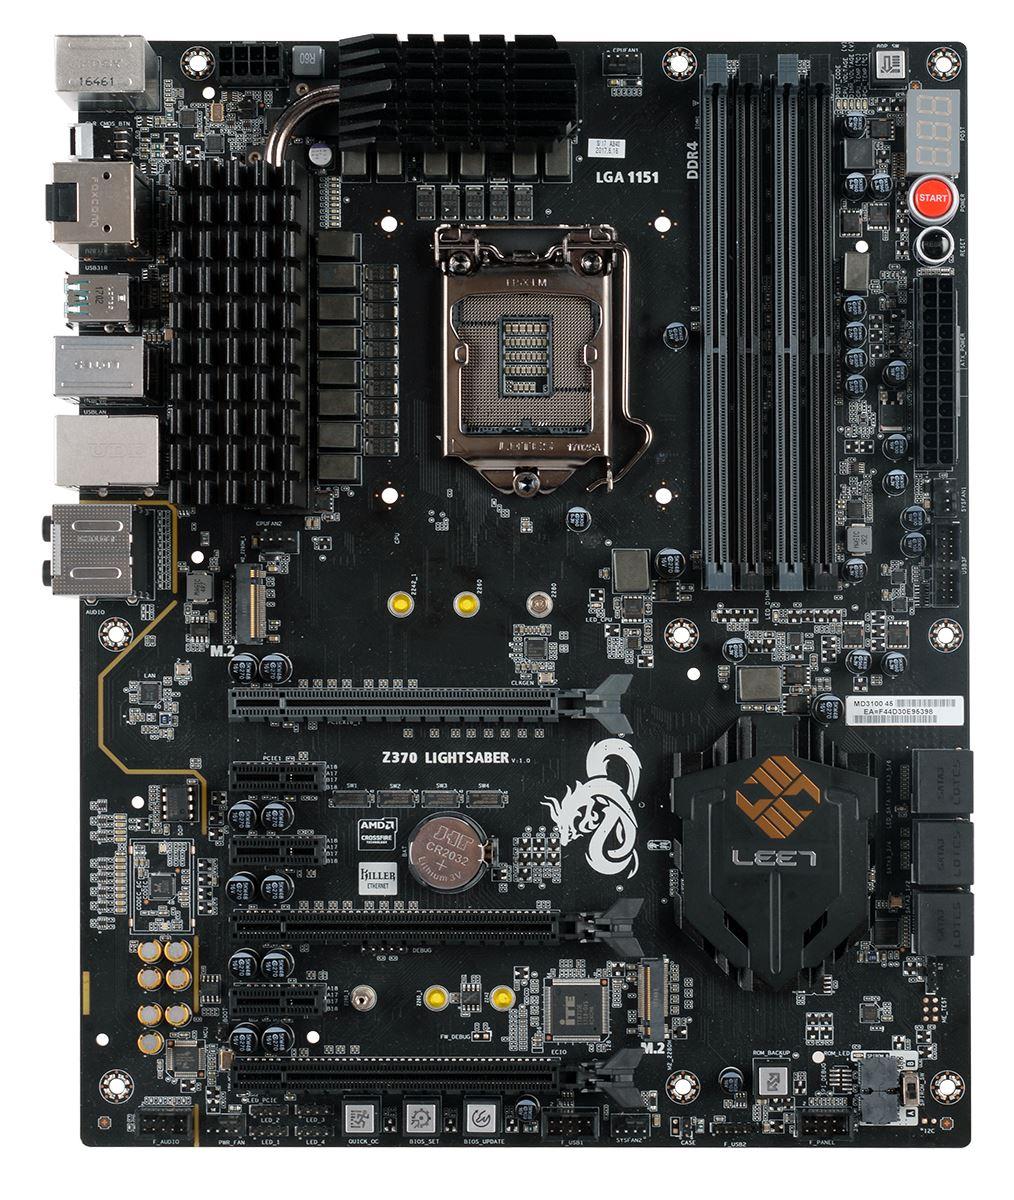 ECS Z370 Lightsaber - Analyzing Z370 for Intel's 8th Generation